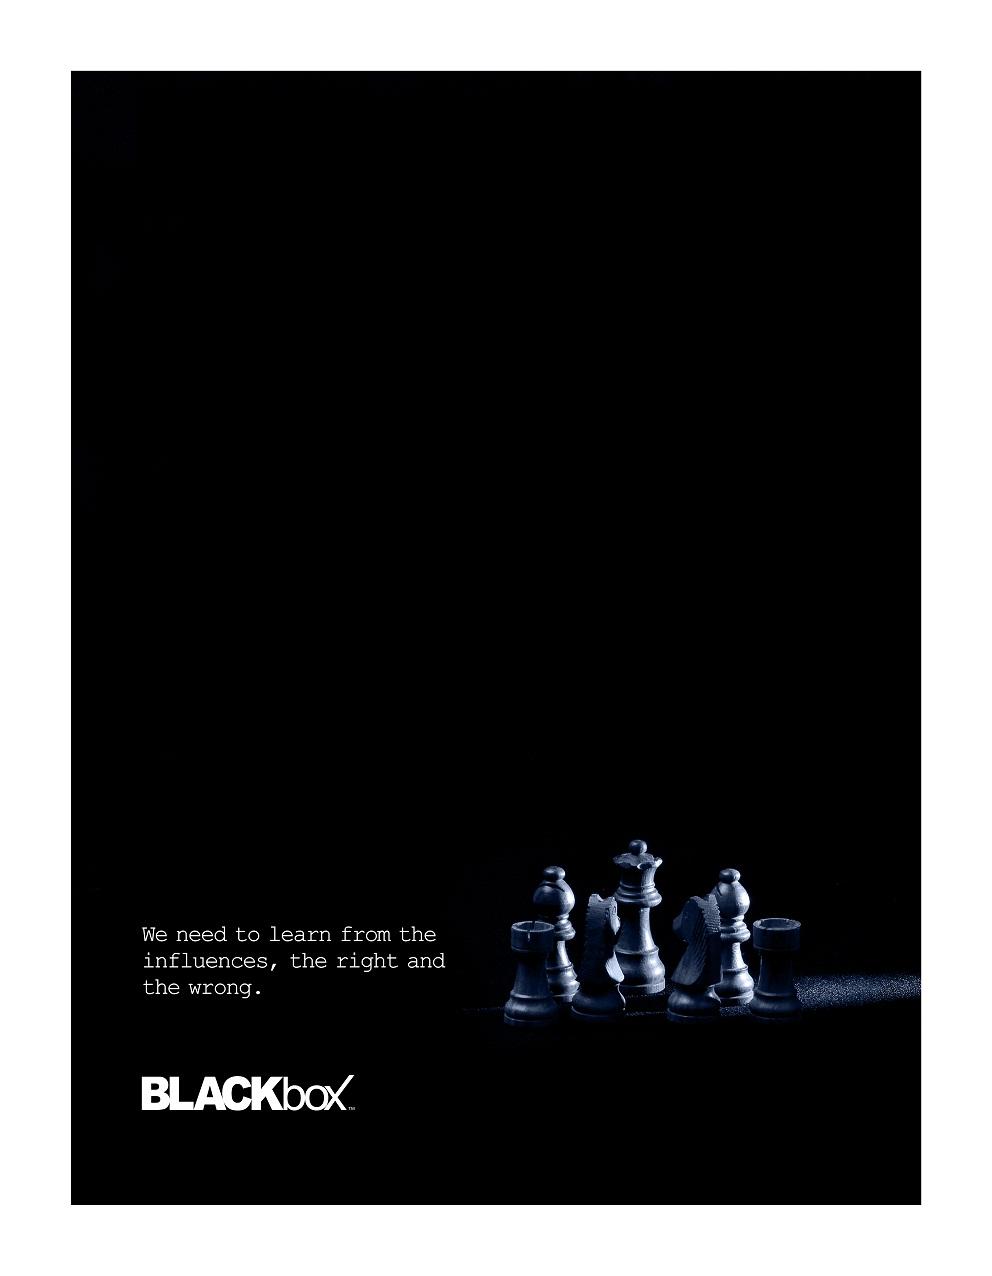 blackbox-conc-caravan-mar2012-finalversion-forpress-insidecover